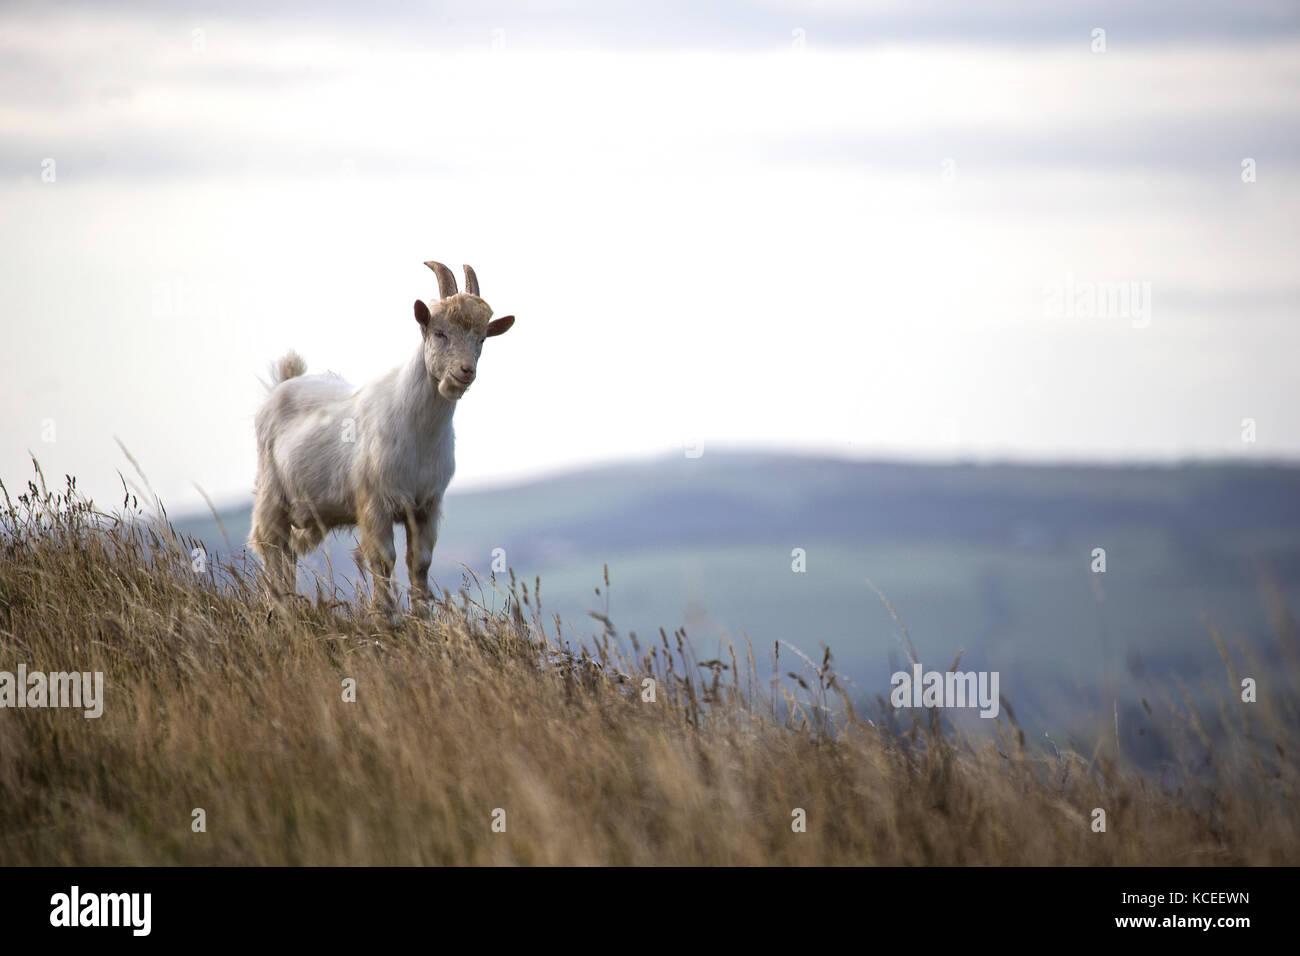 Young Kashmiri mountain goat  Capra falconeri cashmiriensis Capra Markhor on hillside of Great Orme, North Wales - Stock Image